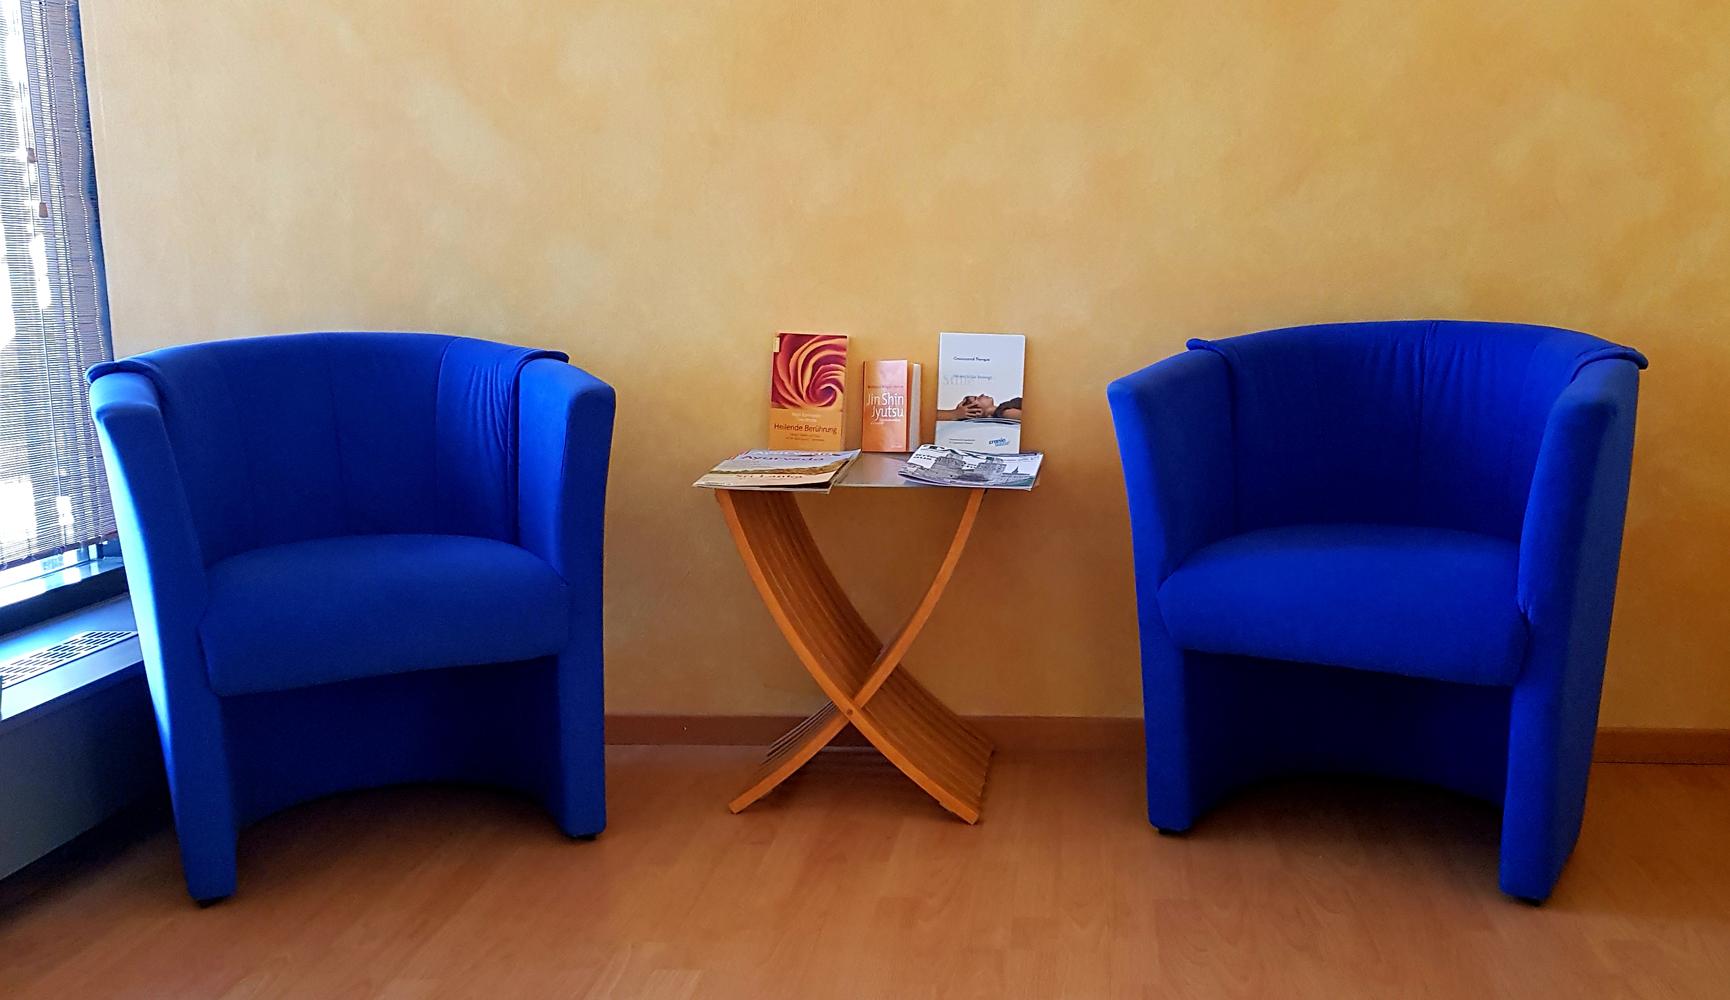 Viva-Gesundheitspraxis-Gallerie-(25)